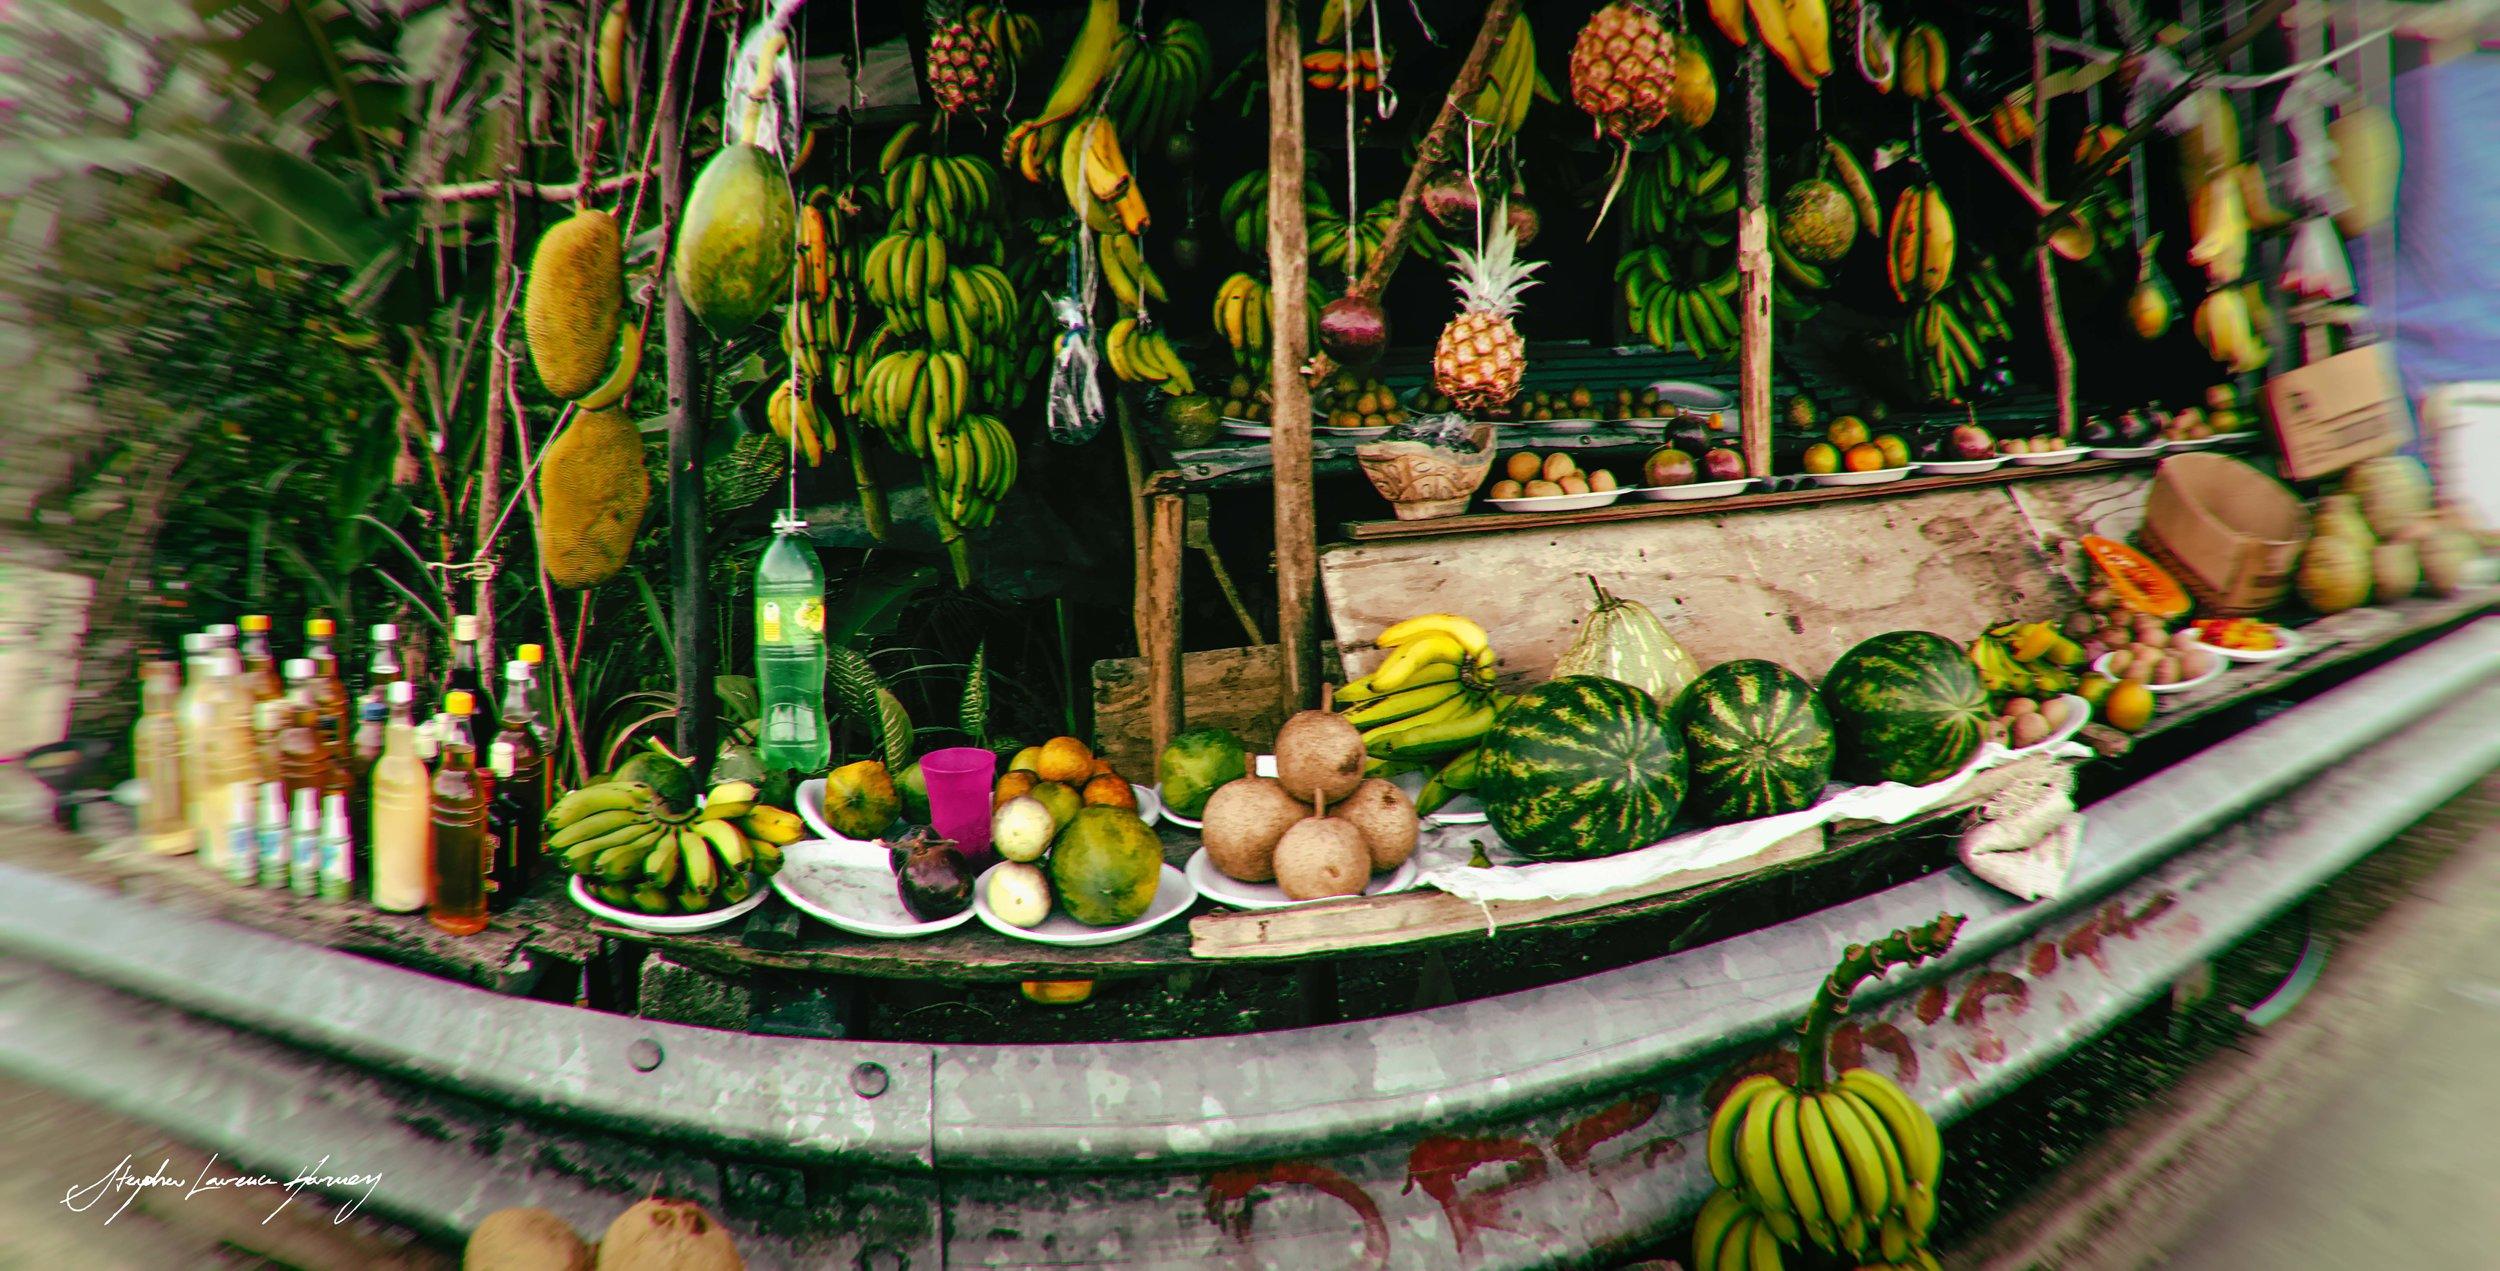 Jamaica fruits (1 of 1).jpg